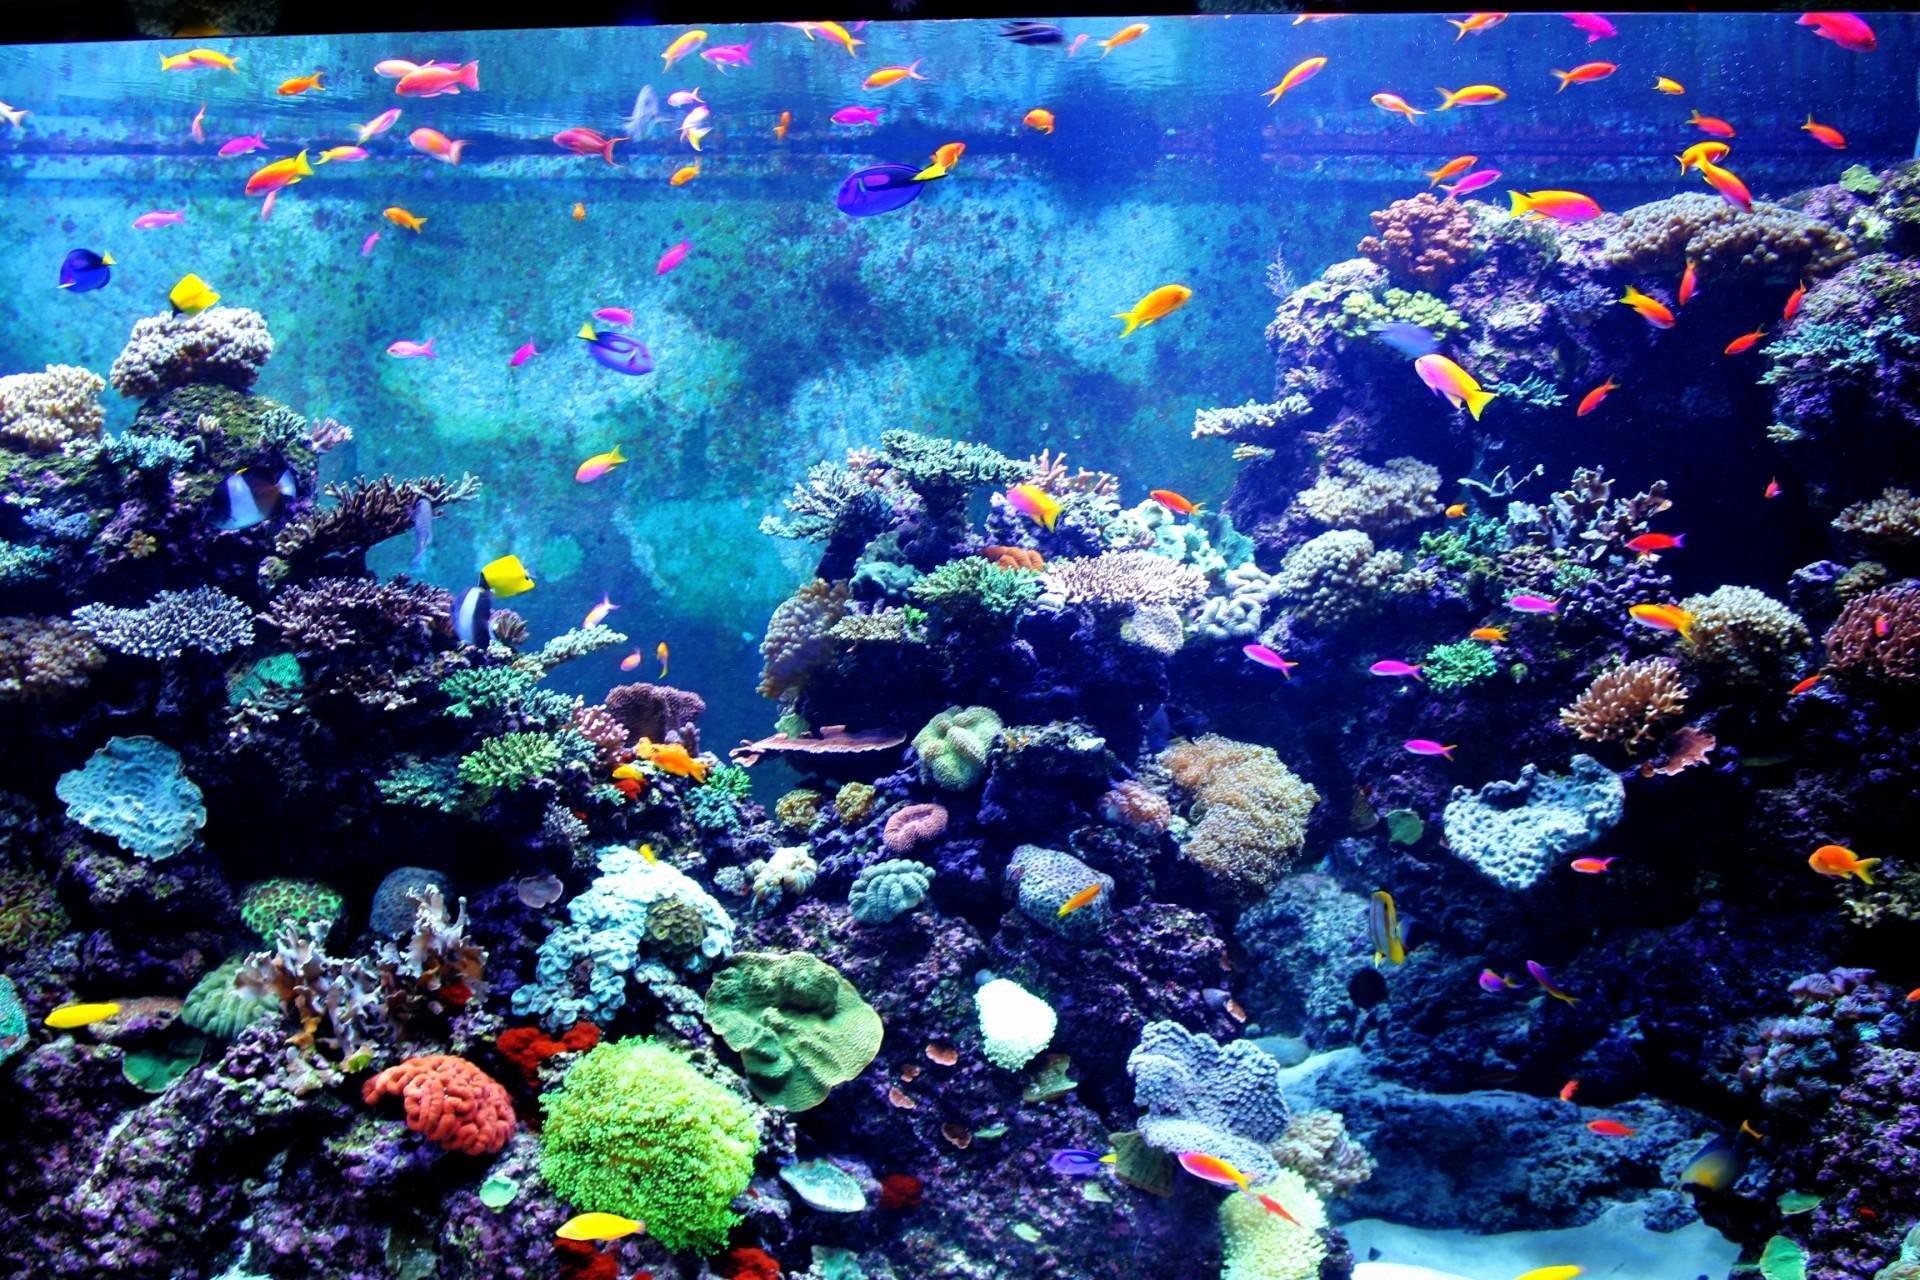 3d Fish Tank Wallpaper Luxury 3d Fish Tank Wallpaper 59 Images